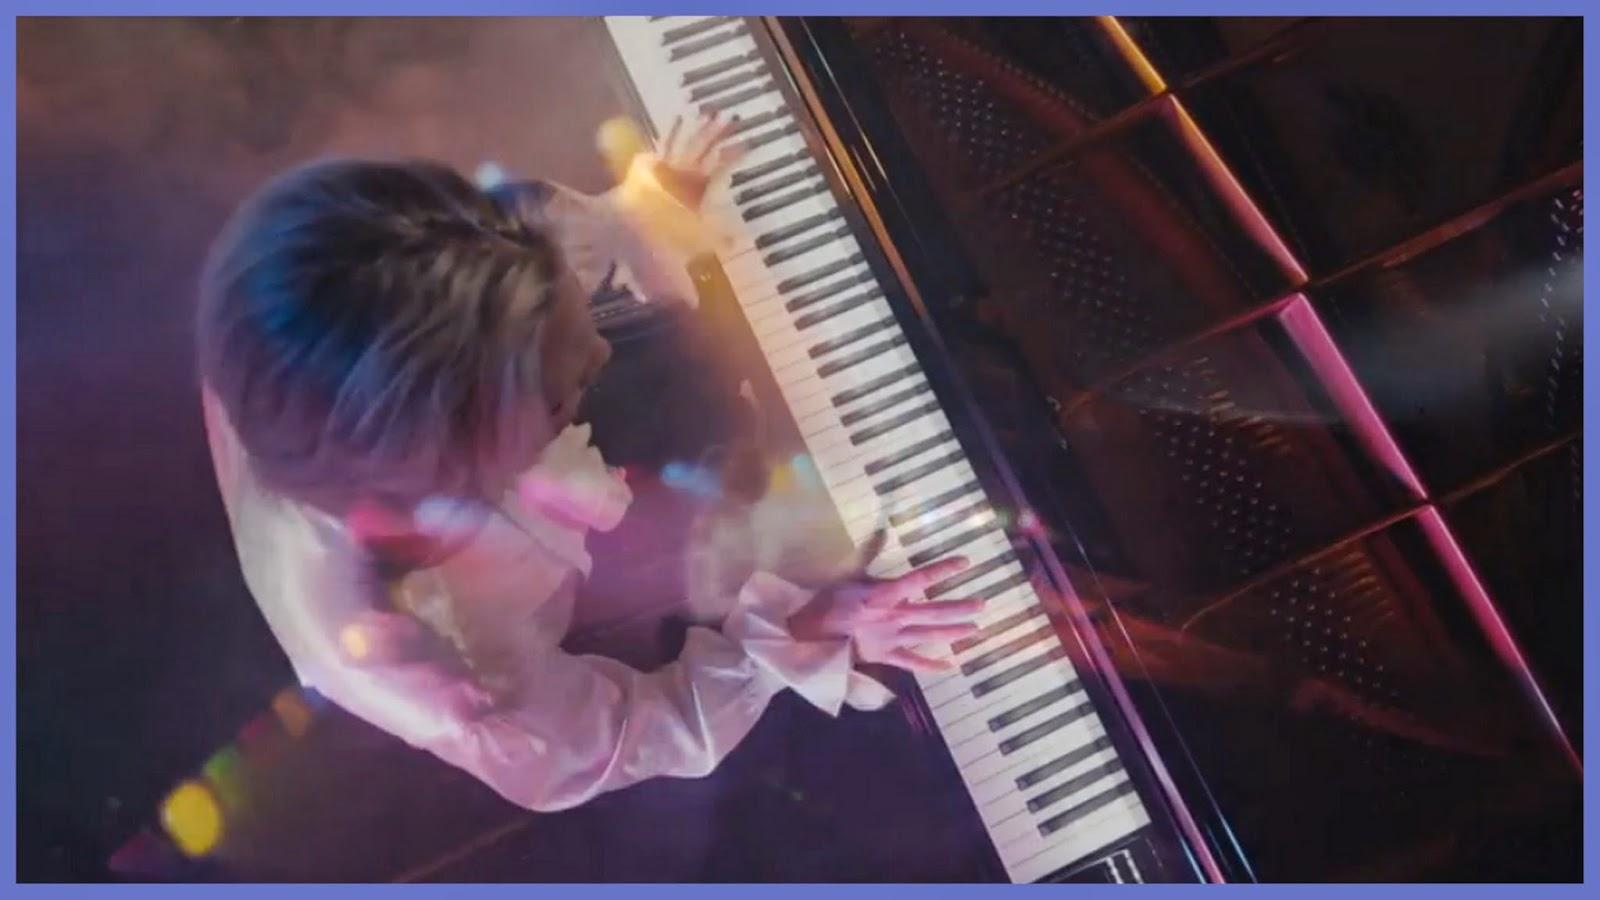 Re -Train Your Brain To Happiness: Jarrod Radnich - Virtuosic Piano